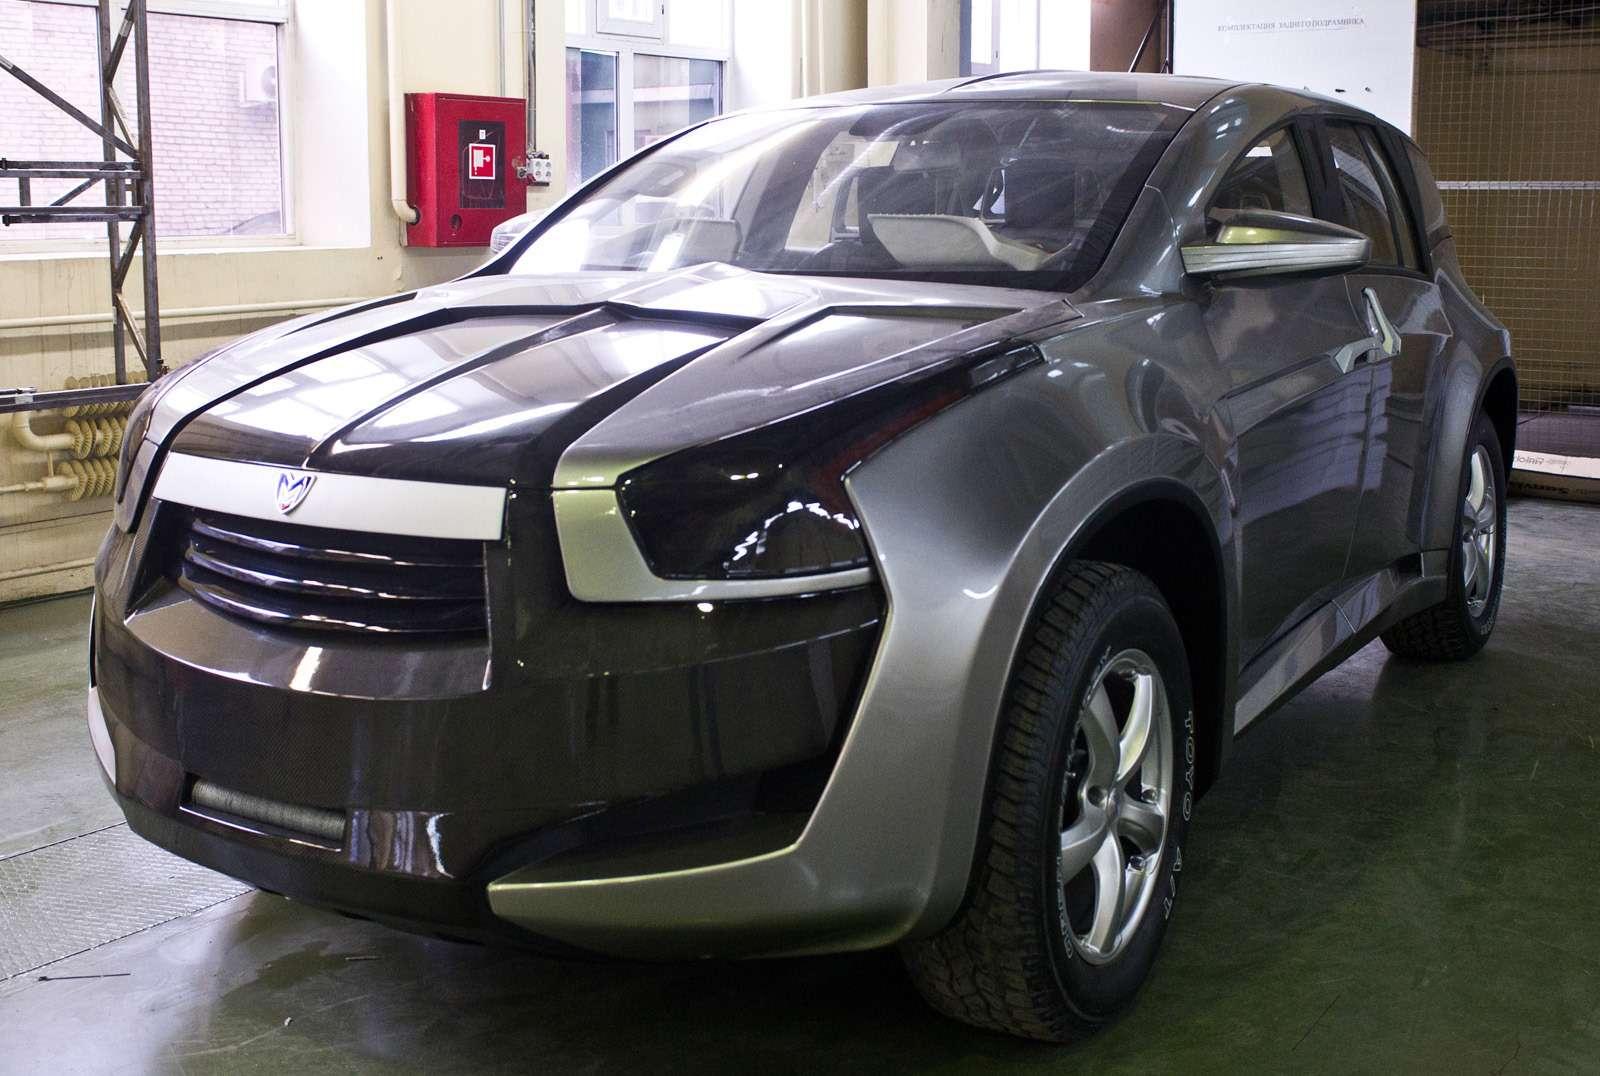 Сибиряк скупил все суперкары Marussia: онхочет возродить бренд— фото 816115